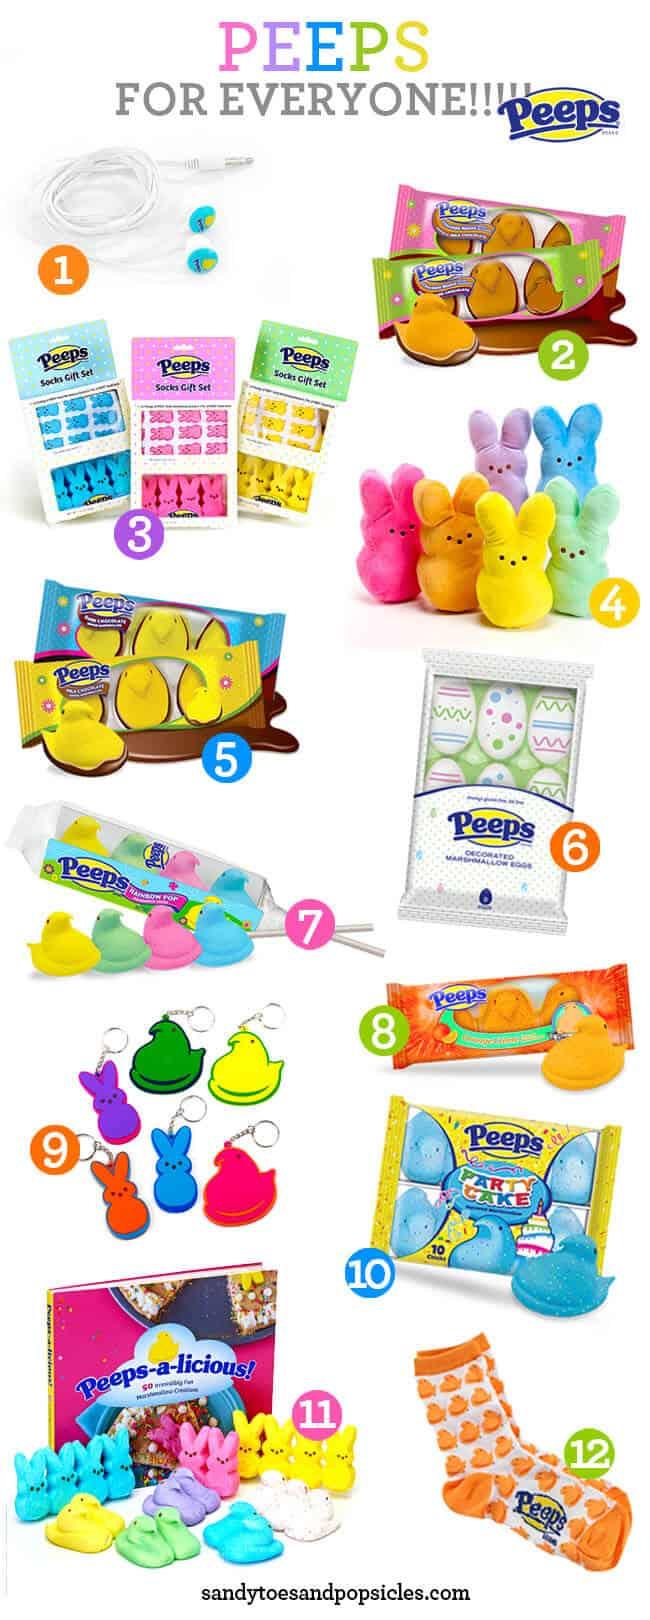 Fun Peeps Gifts for Everyone